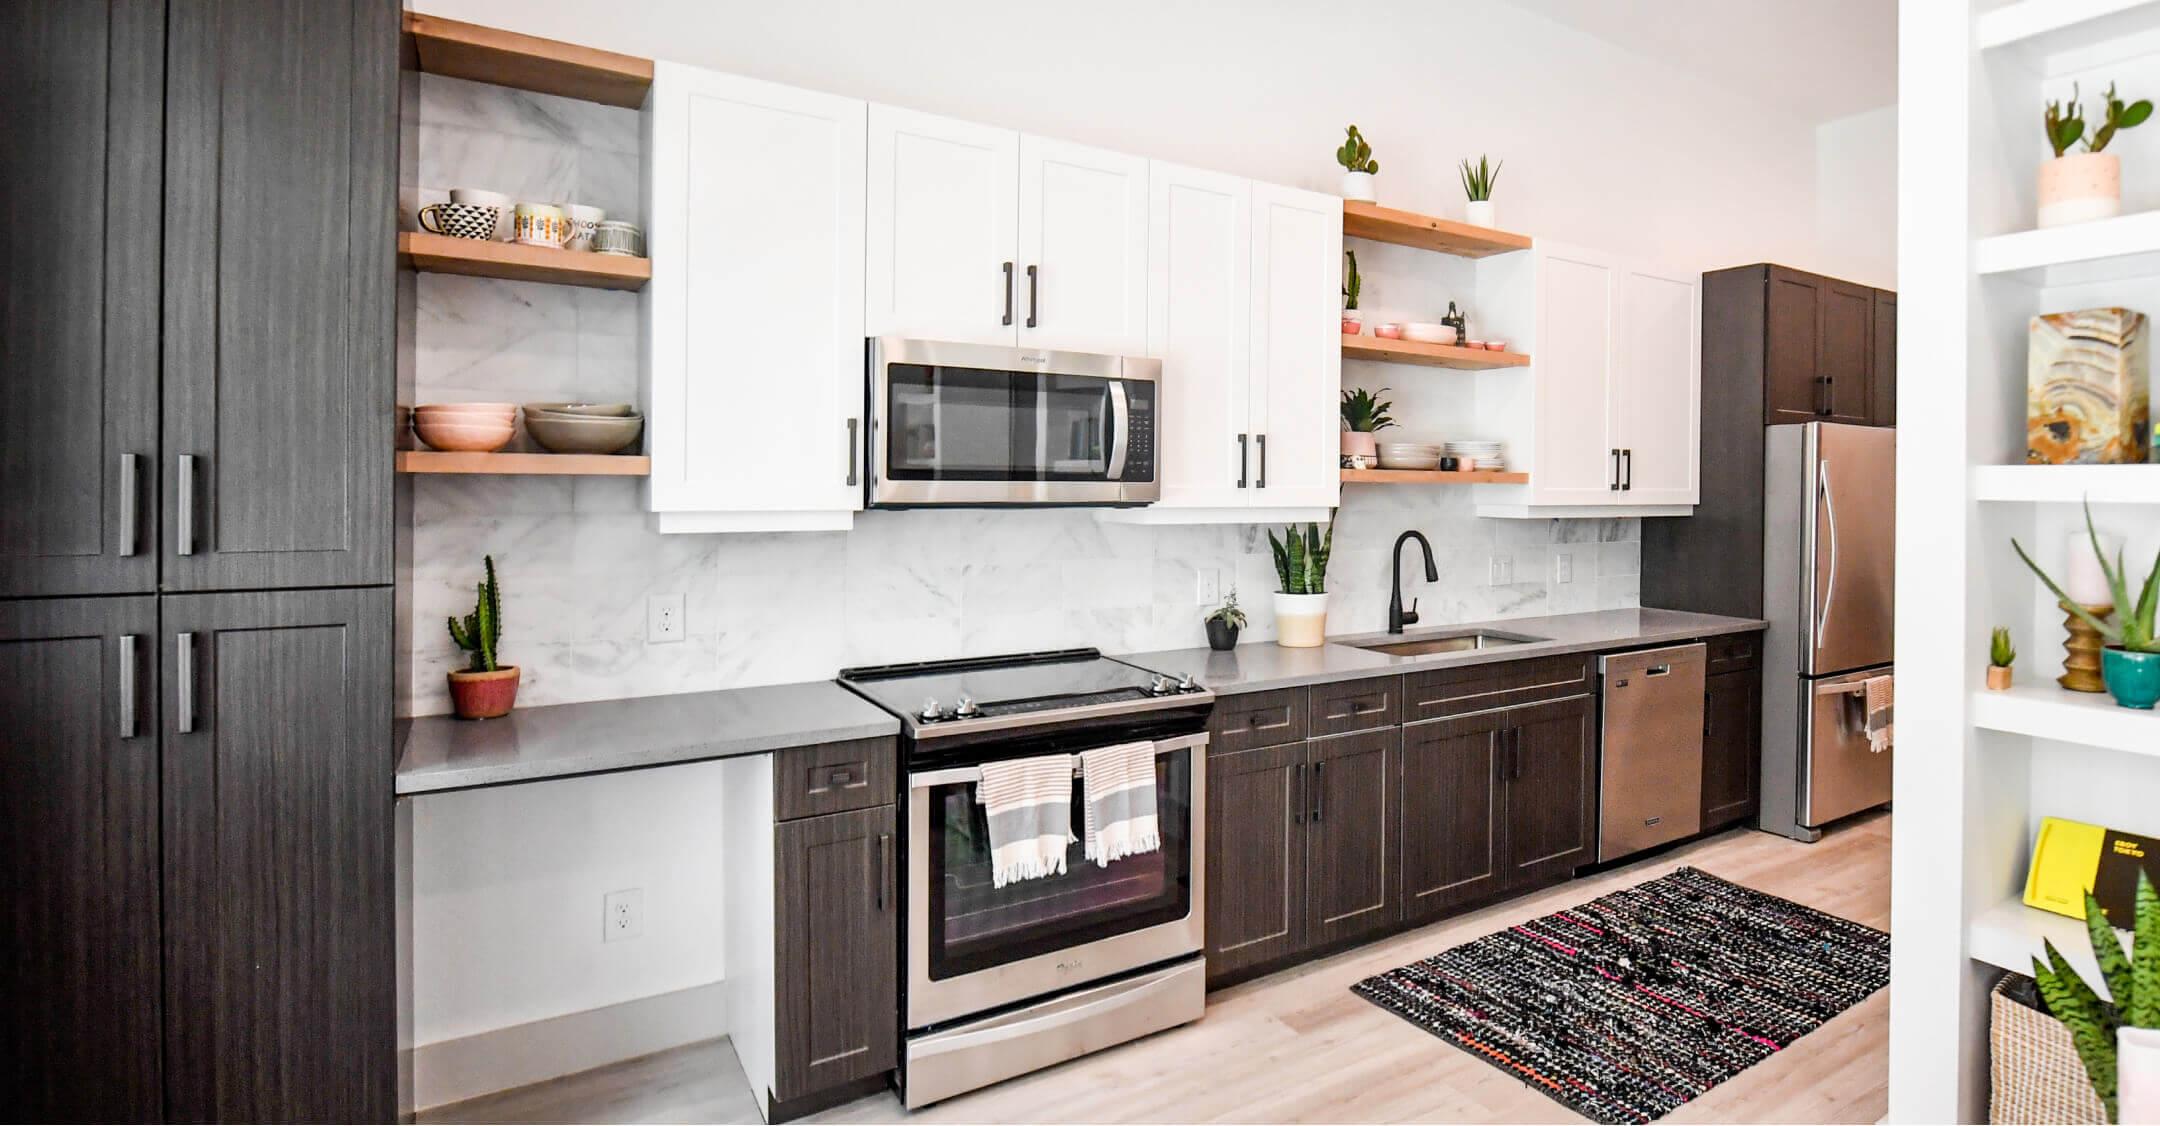 Image of Bishop North kitchen at Bishop Arts